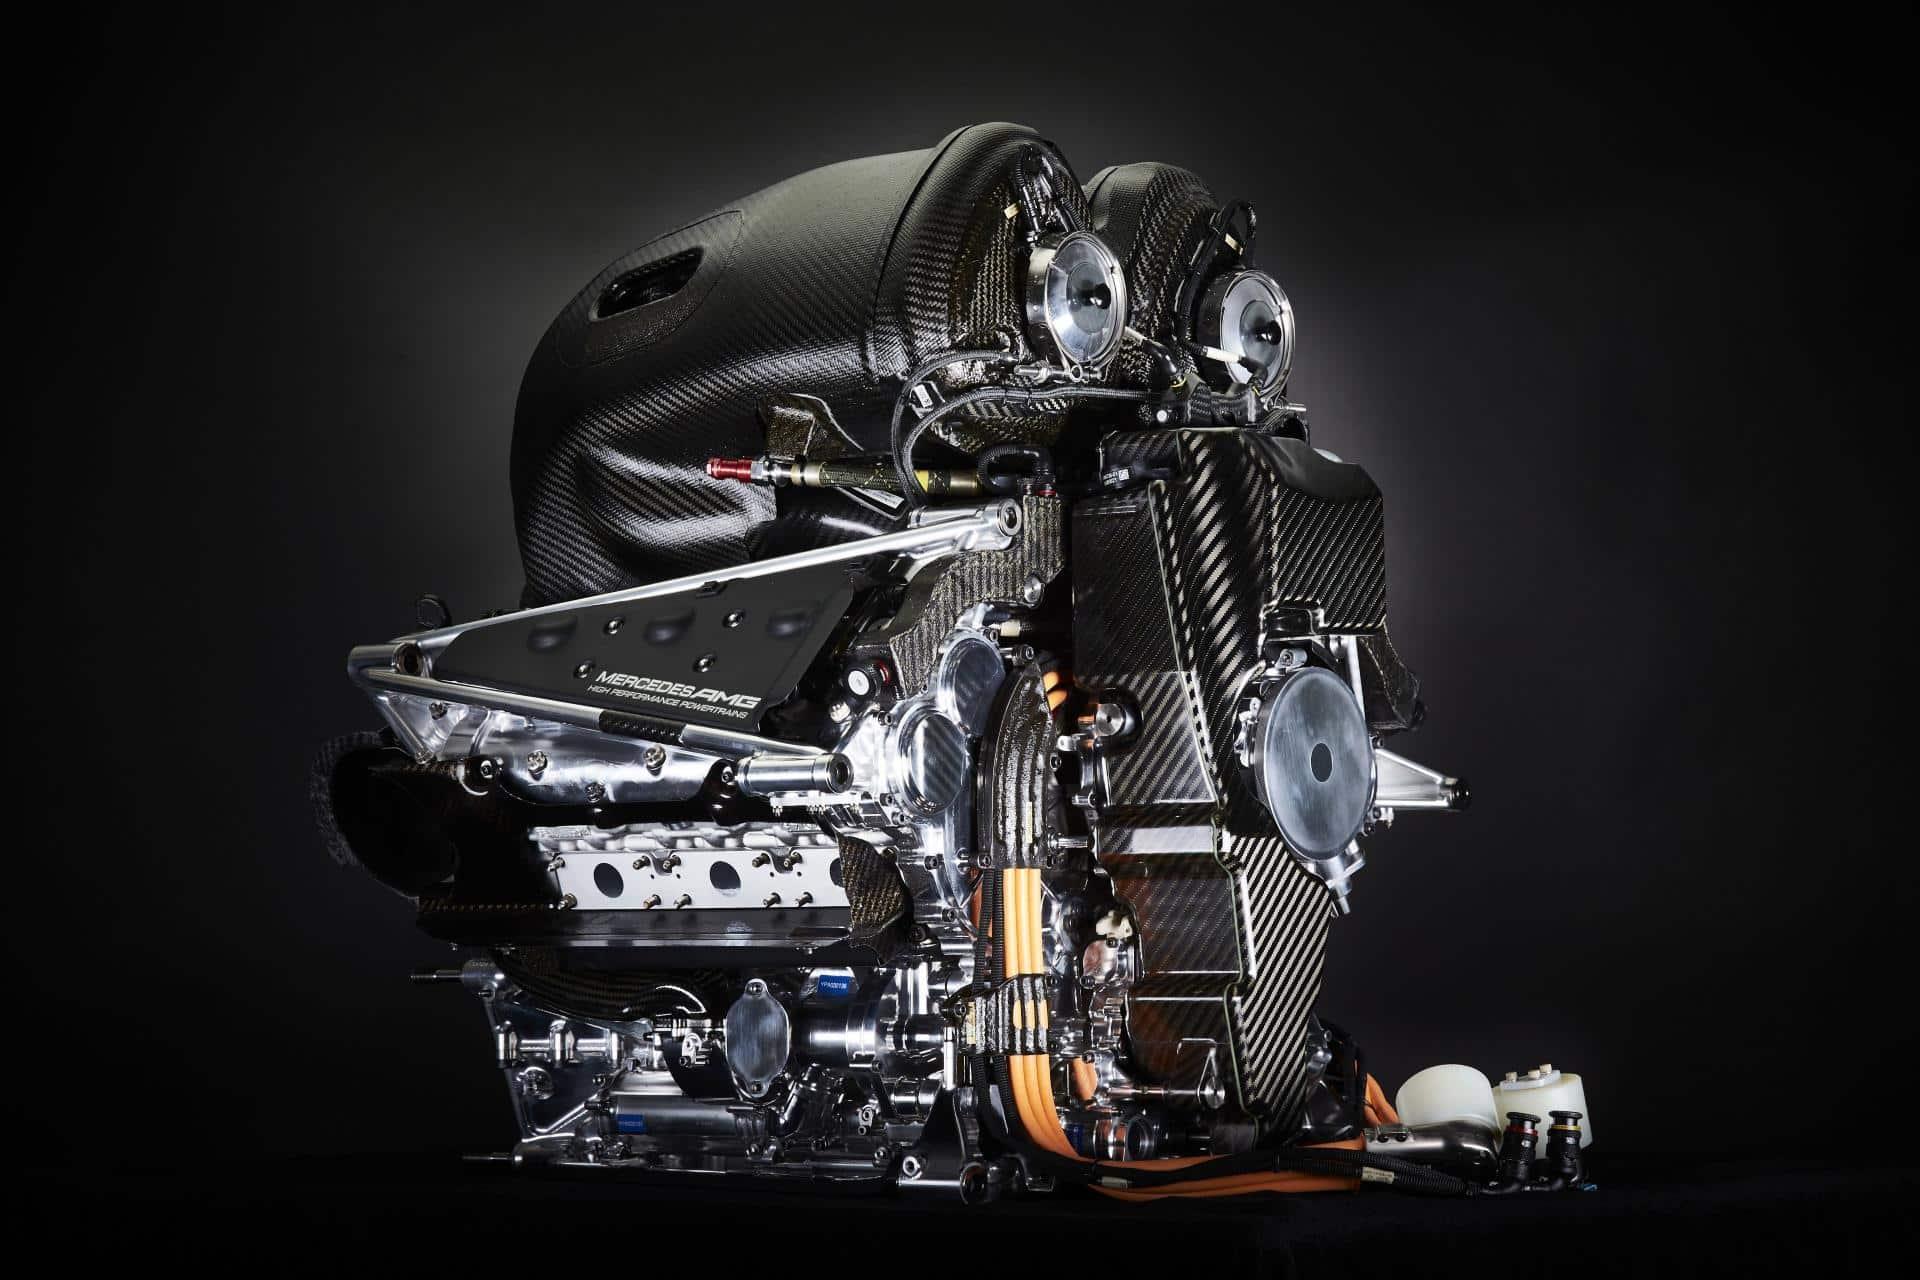 mercedes-f1-engine-foto-daimler.jpg